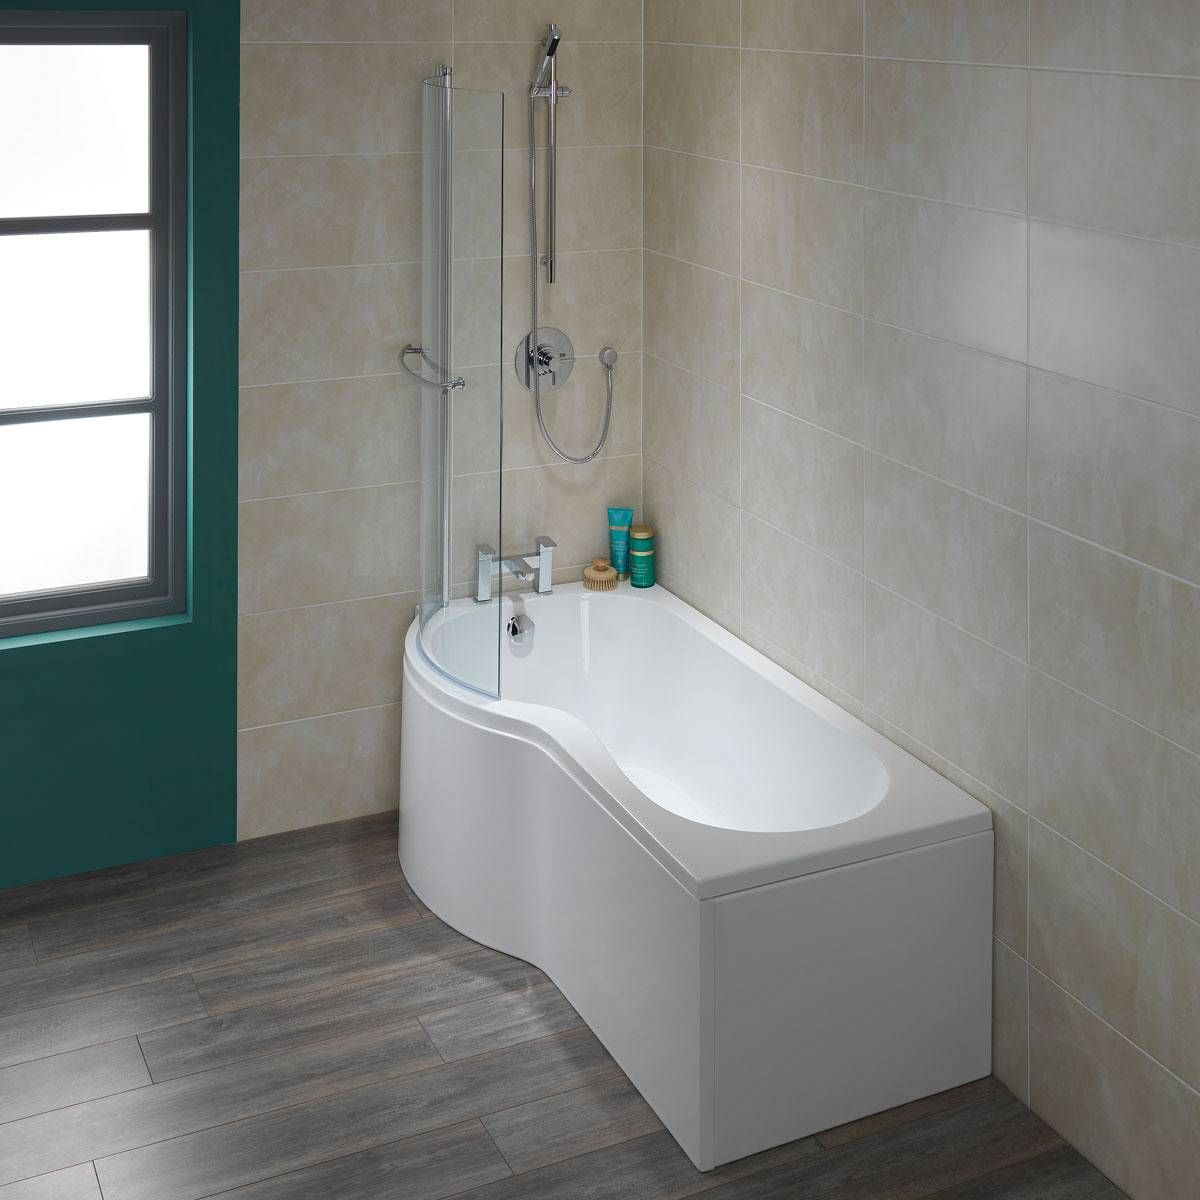 p shape shower bath 1700 lh screen bathroom pinterest p shape shower bath 1700 lh screen